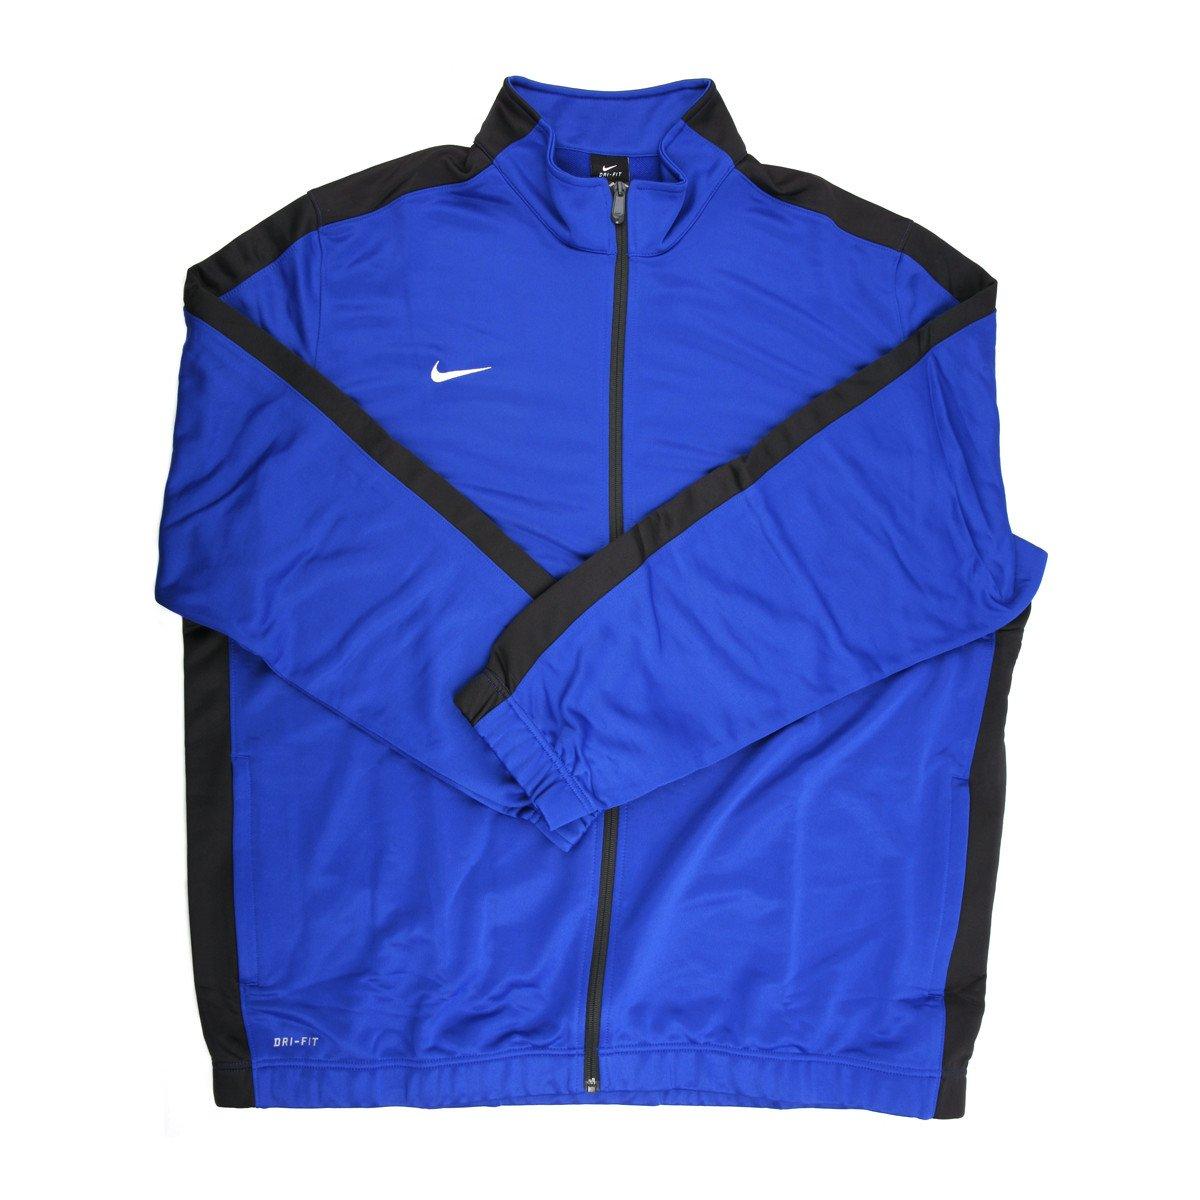 NIKE Adult Team League Men's Blue/Black Jacket - 3X Large by NIKE